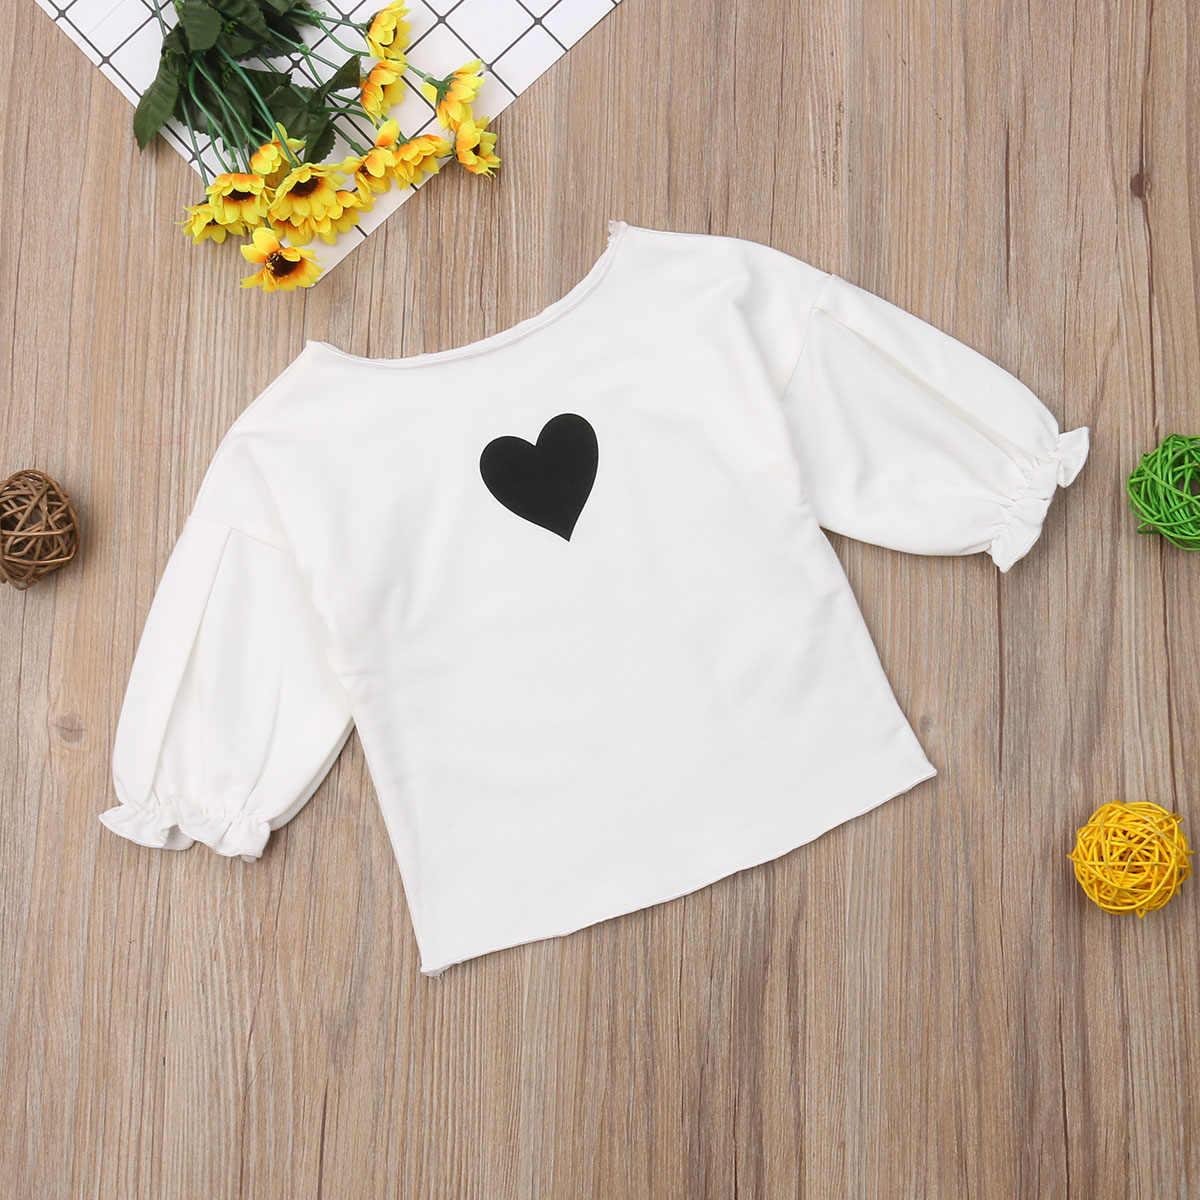 0ac48e78855e8 ... Autumn Pretty Cute Infant Kids Baby Girls Clothes T-Shirts Tops Long  Lantern Sleeve Heart ...